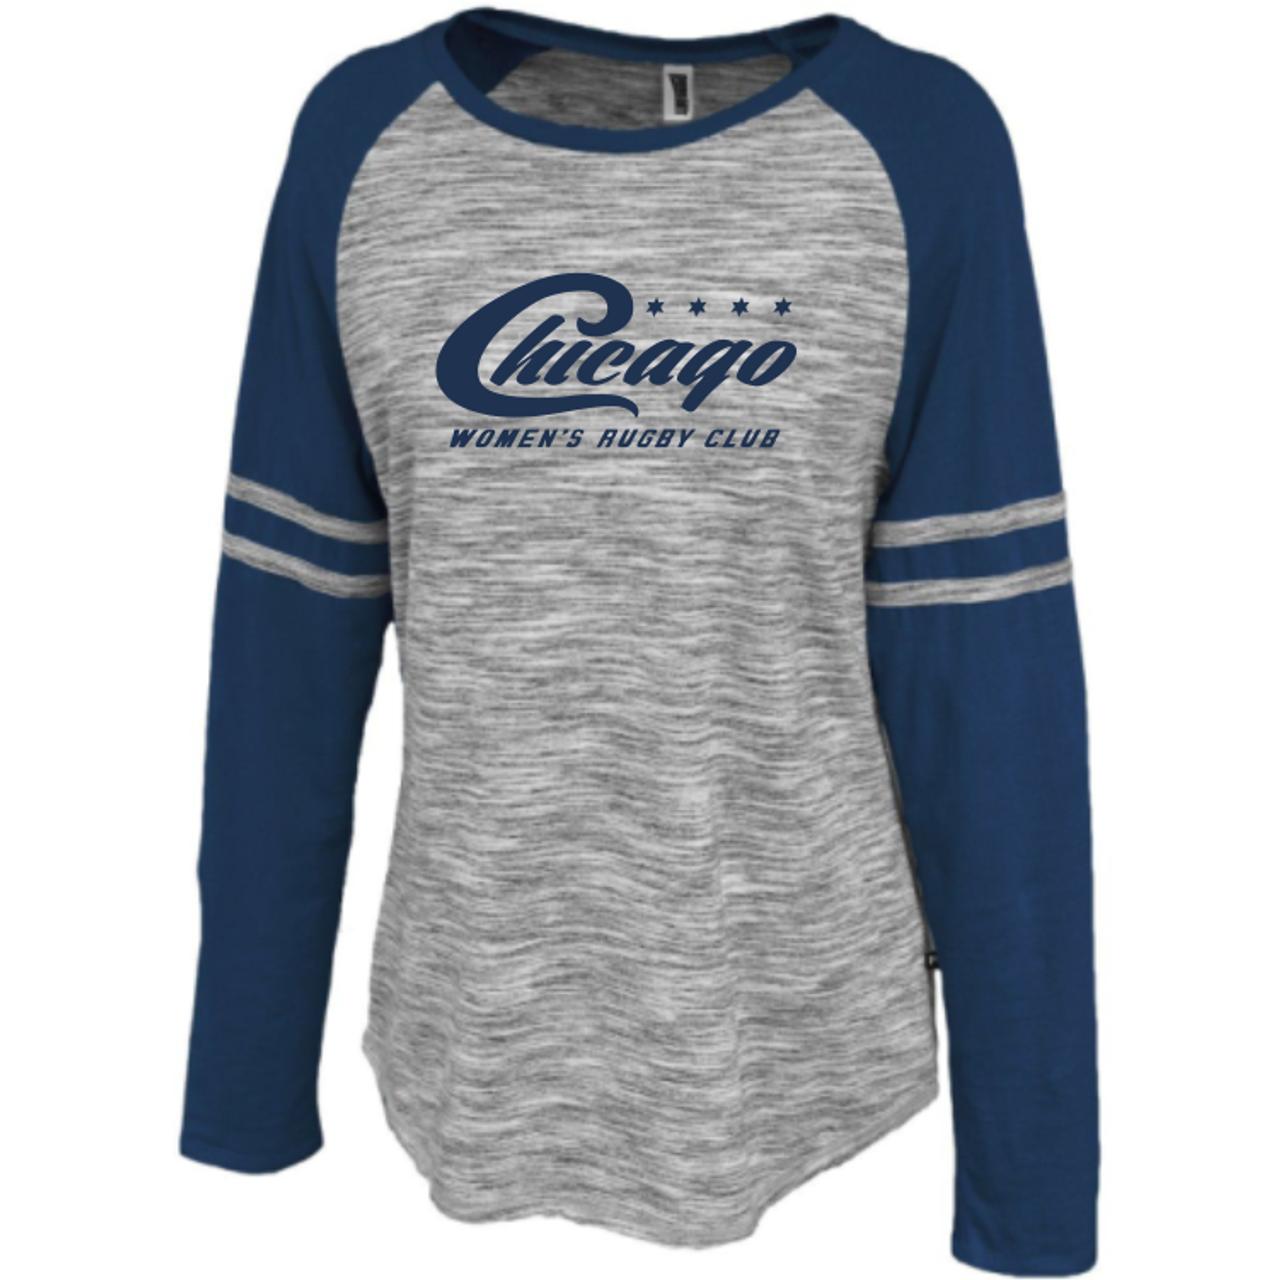 Chicago WRFC Space Dye Ladies-Cut LS Jersey